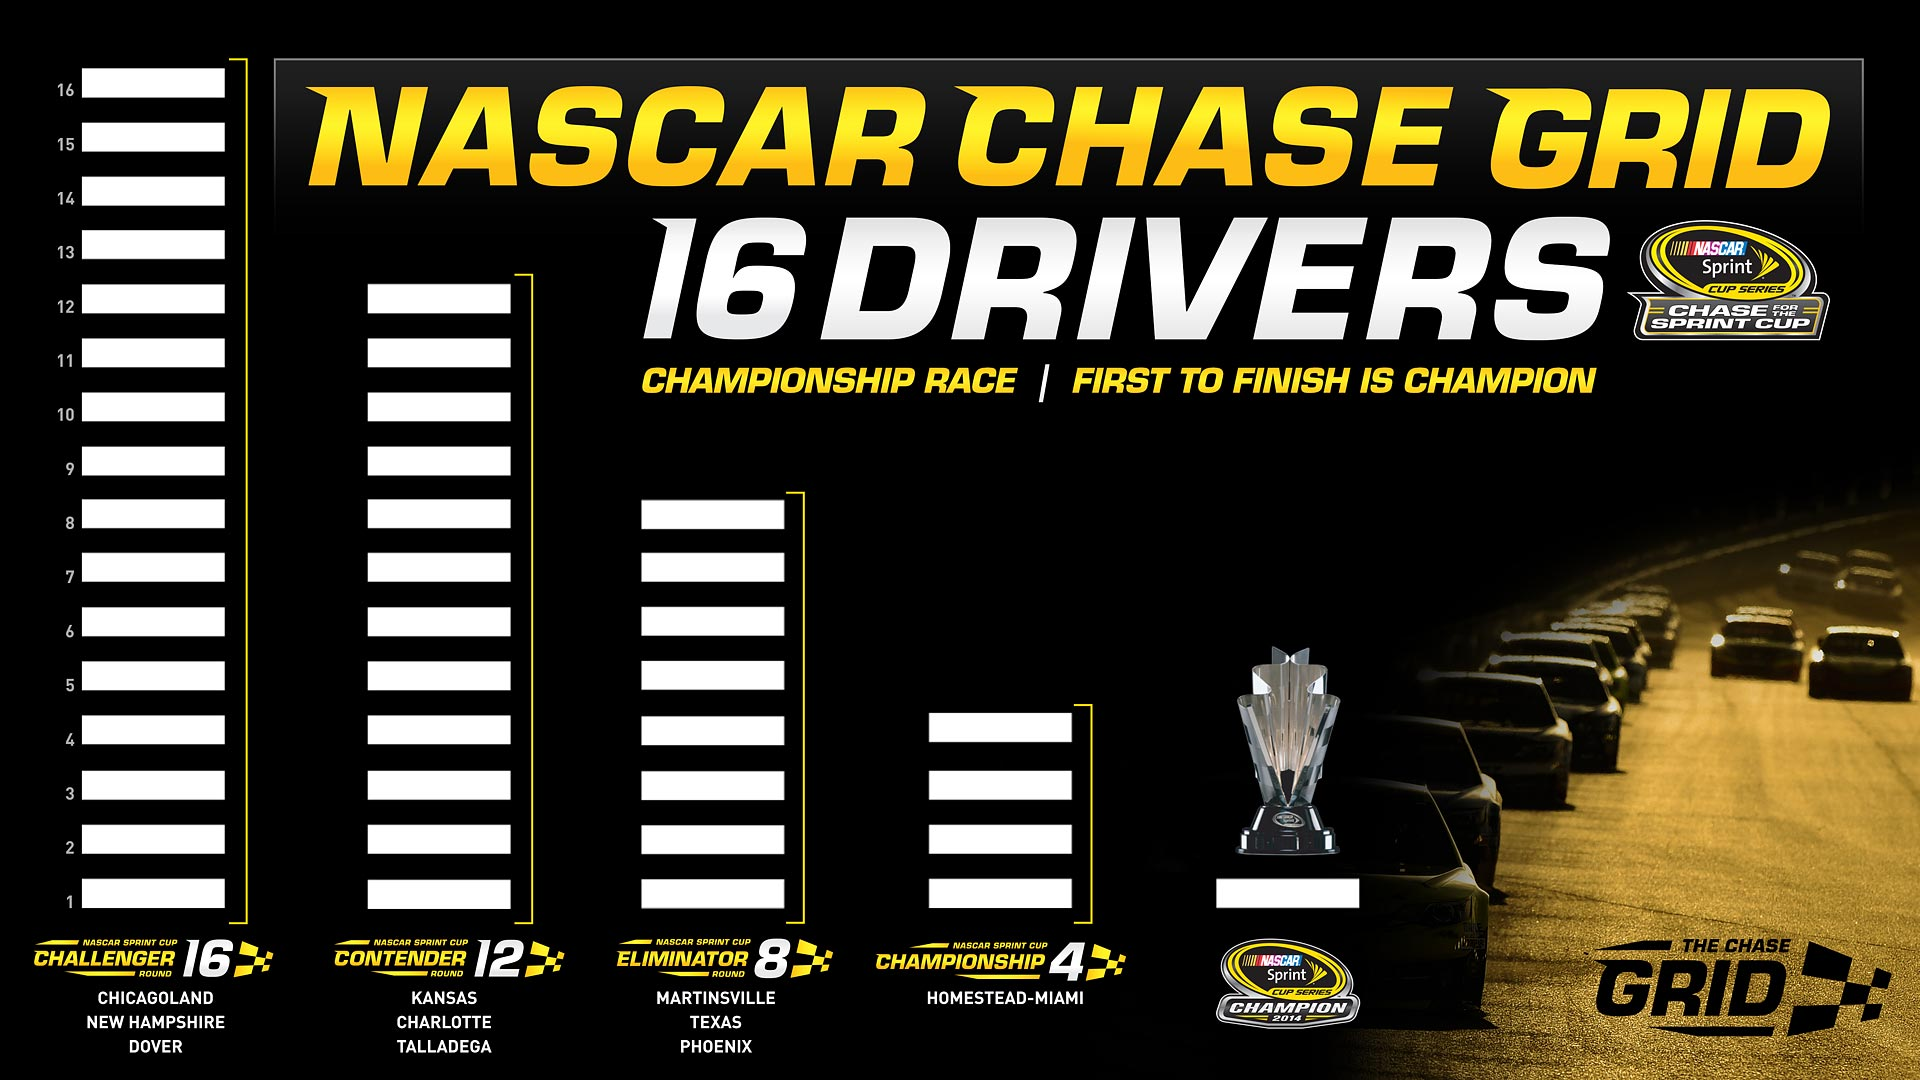 NASCAR grid-013014-NASCAR-FTR.jpg